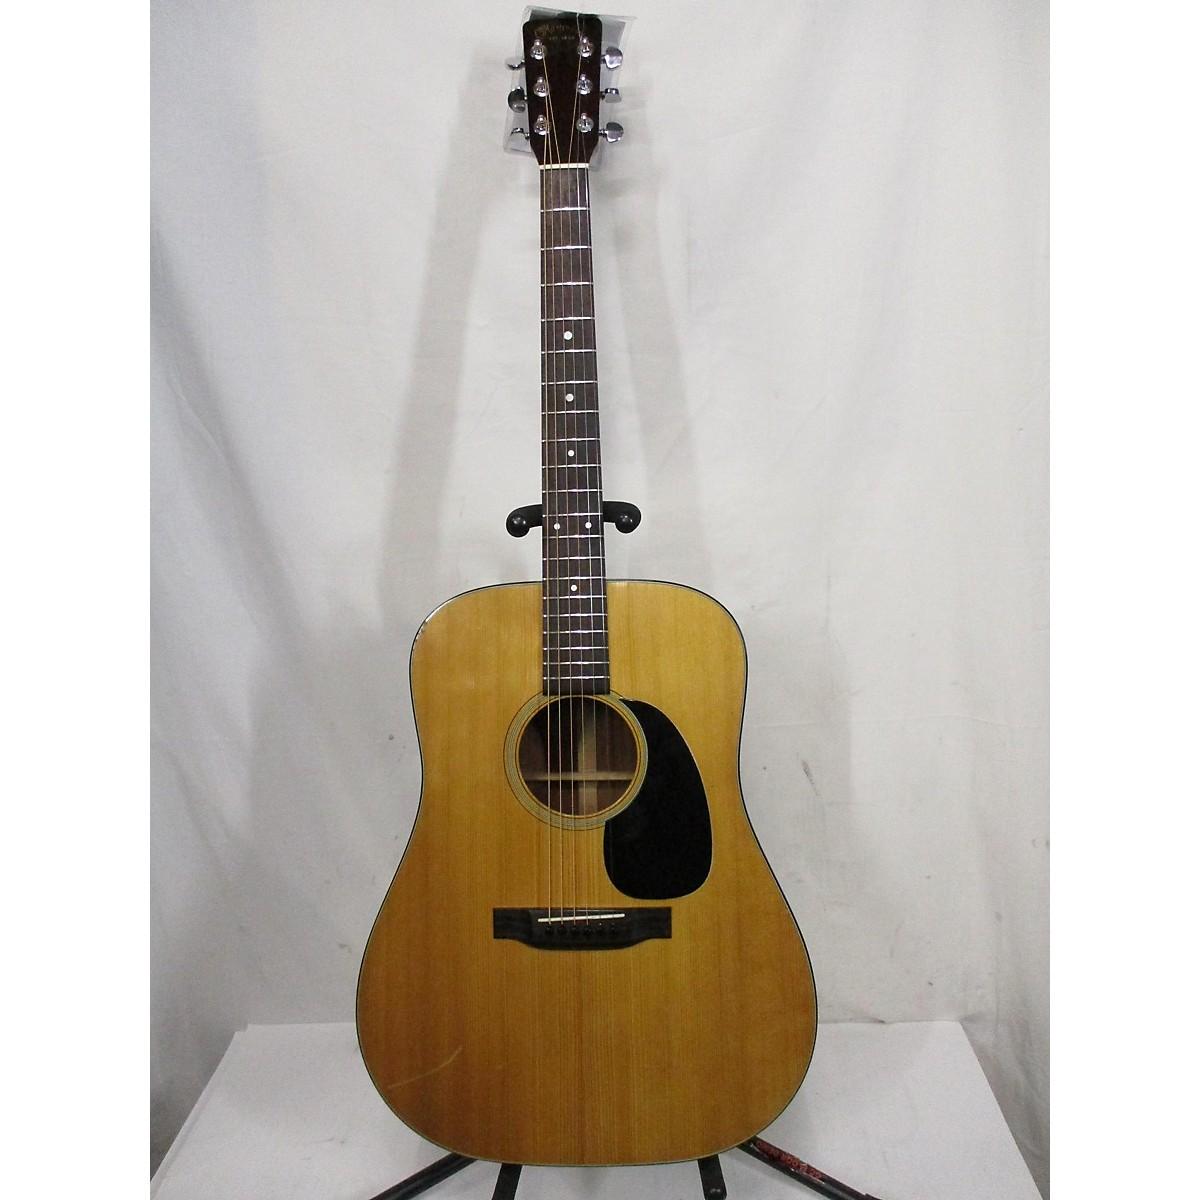 Martin 1972 D-18 Acoustic Electric Guitar